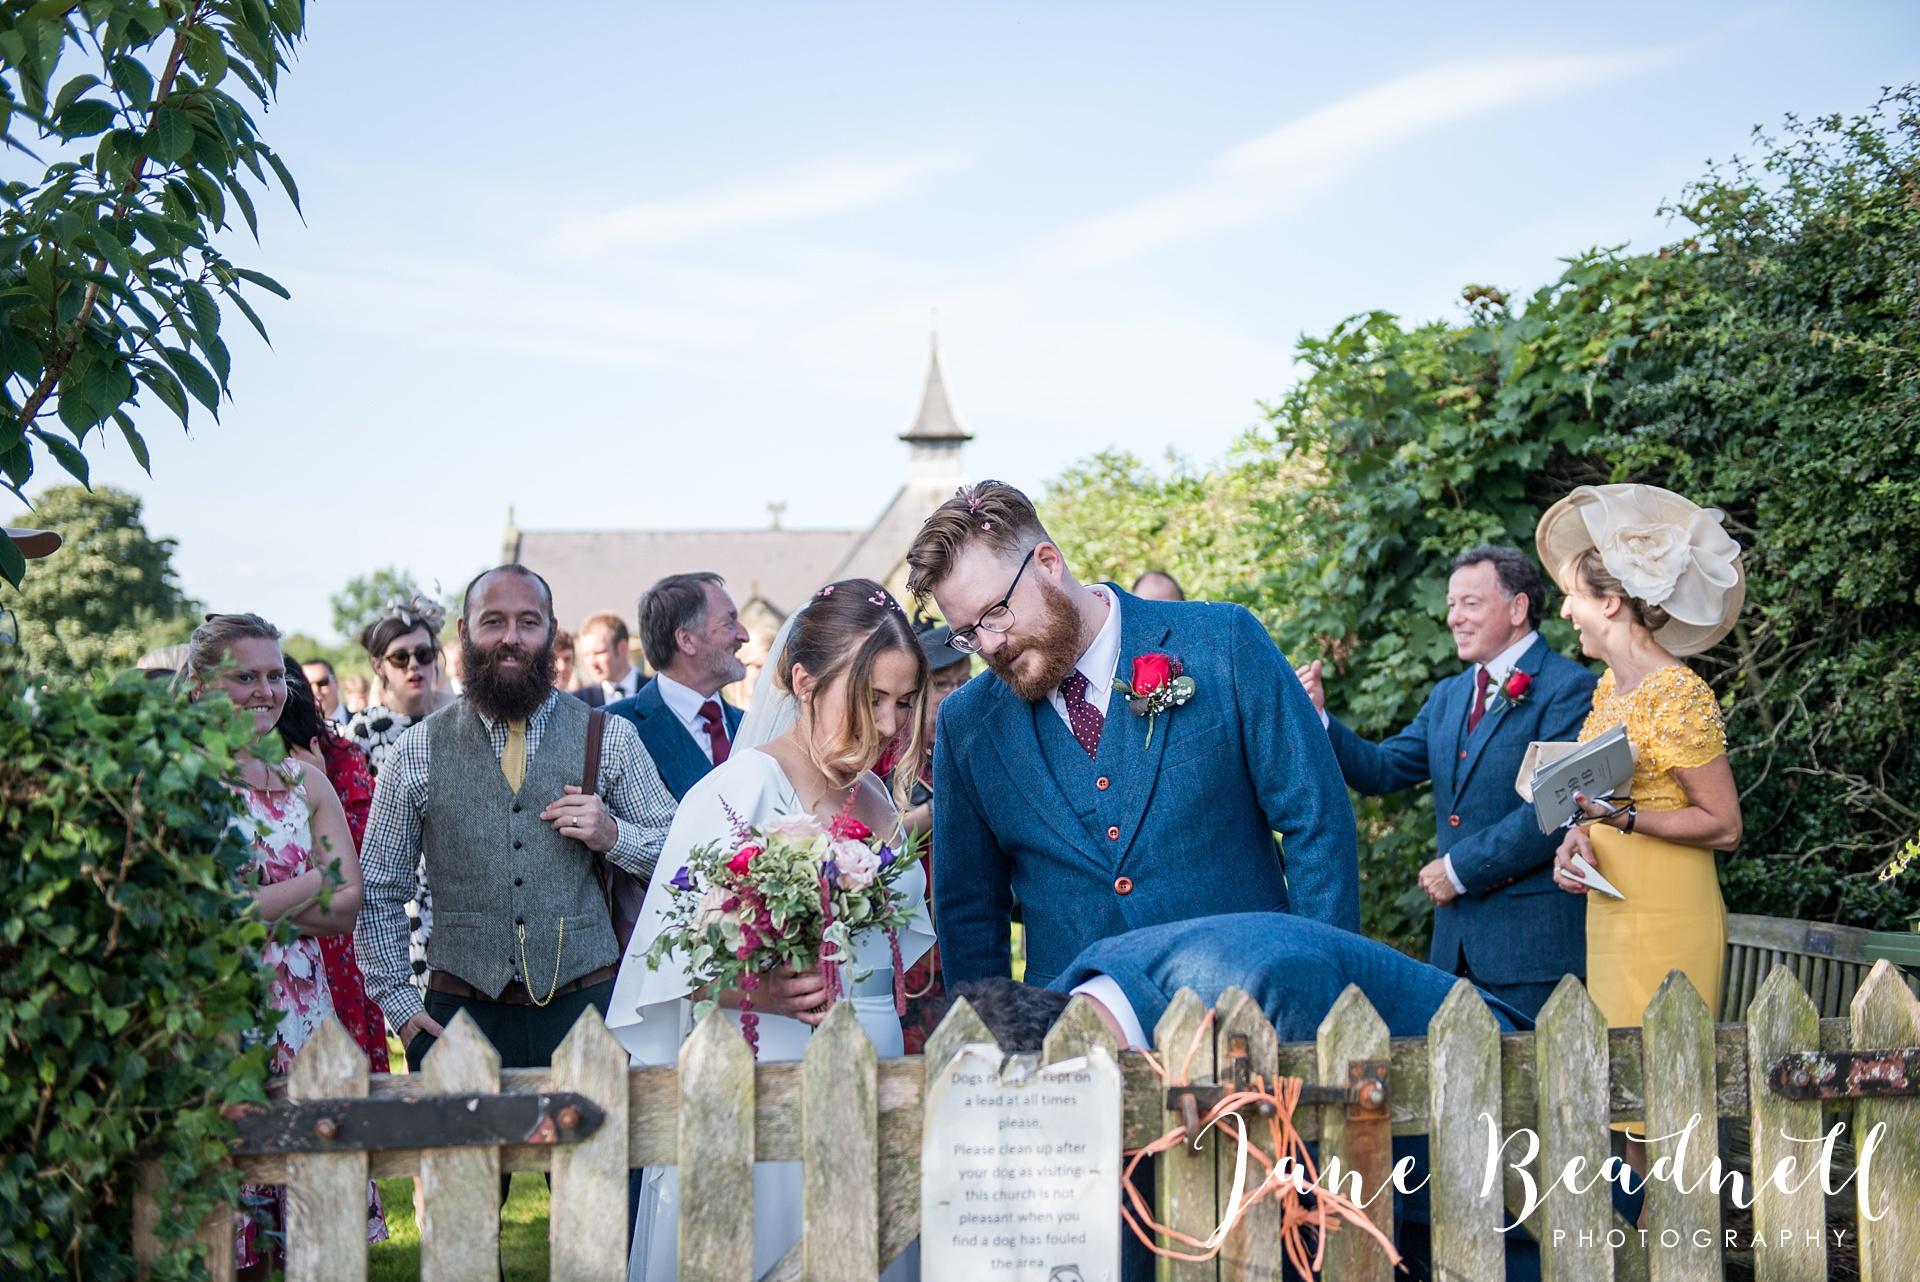 fine-art-wedding-photographer-jane-beadnell-yorkshire-wedding-photographer_0062